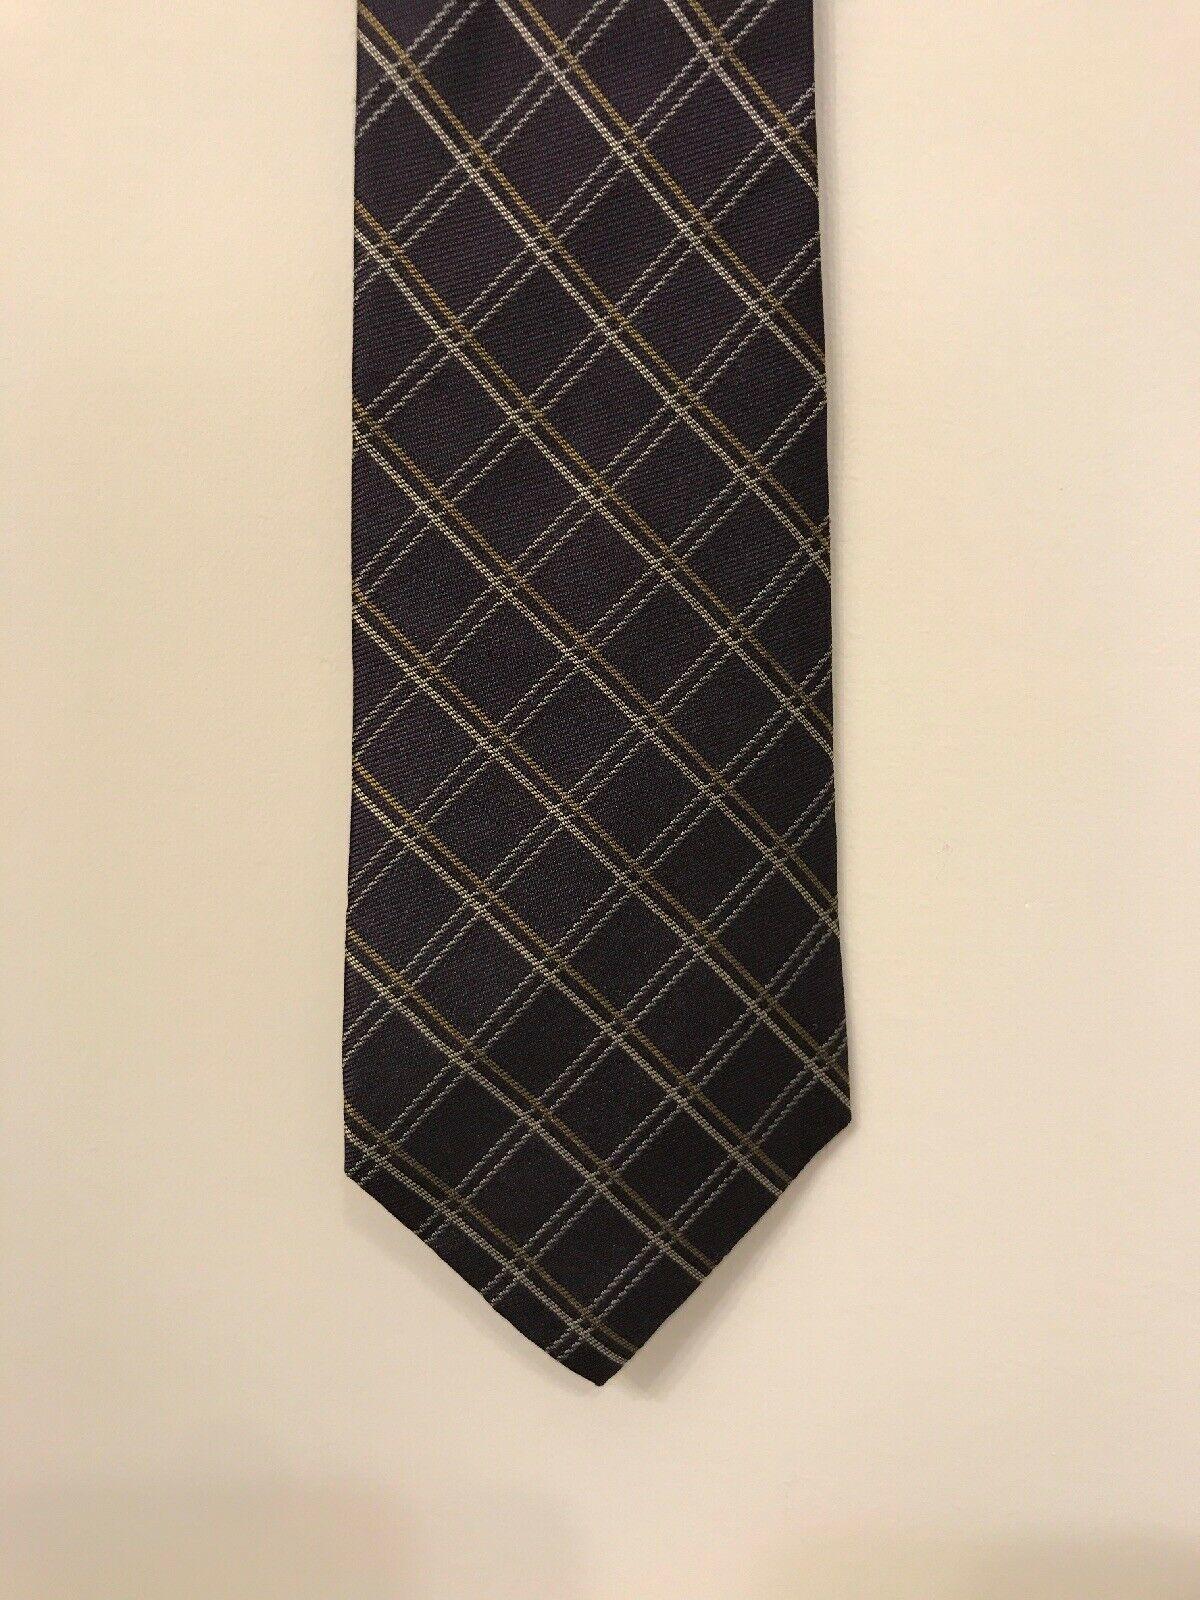 "Gap Men's Silk Tie Tartan Plaid 4""x 60"" Purple - $9.89"